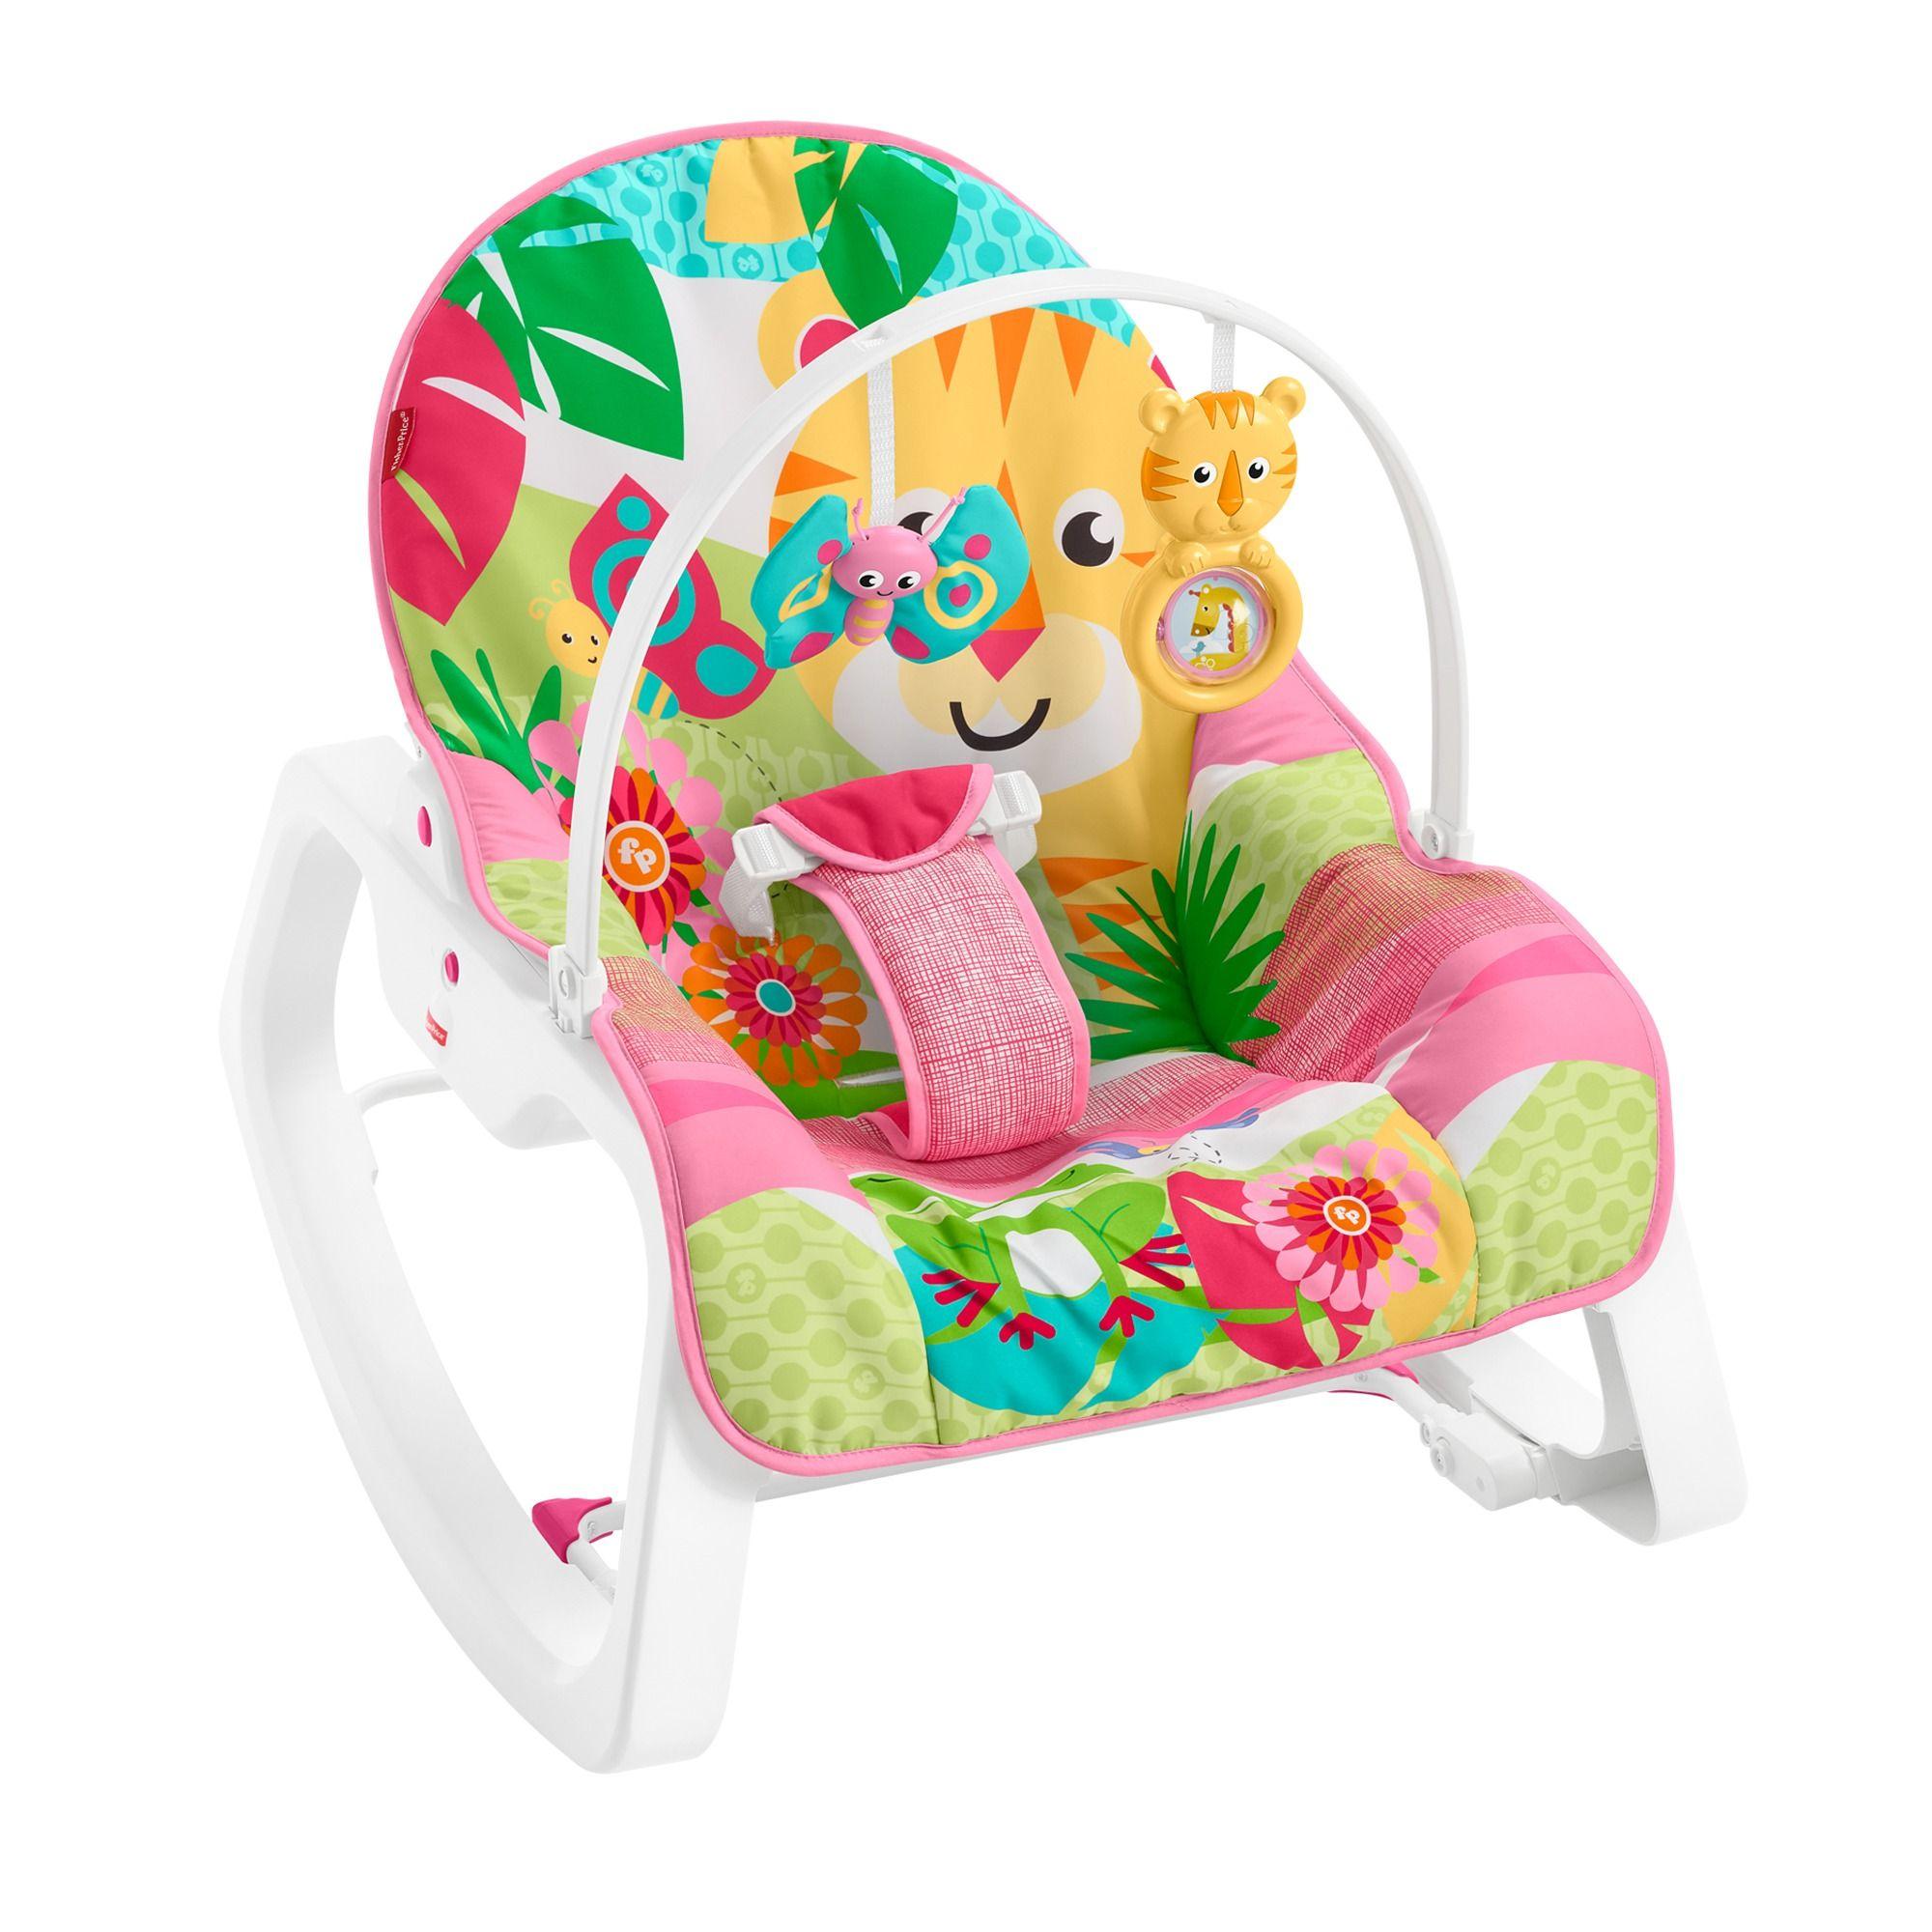 Baby Baby Rocker Fisher Price Toys Fisher Price